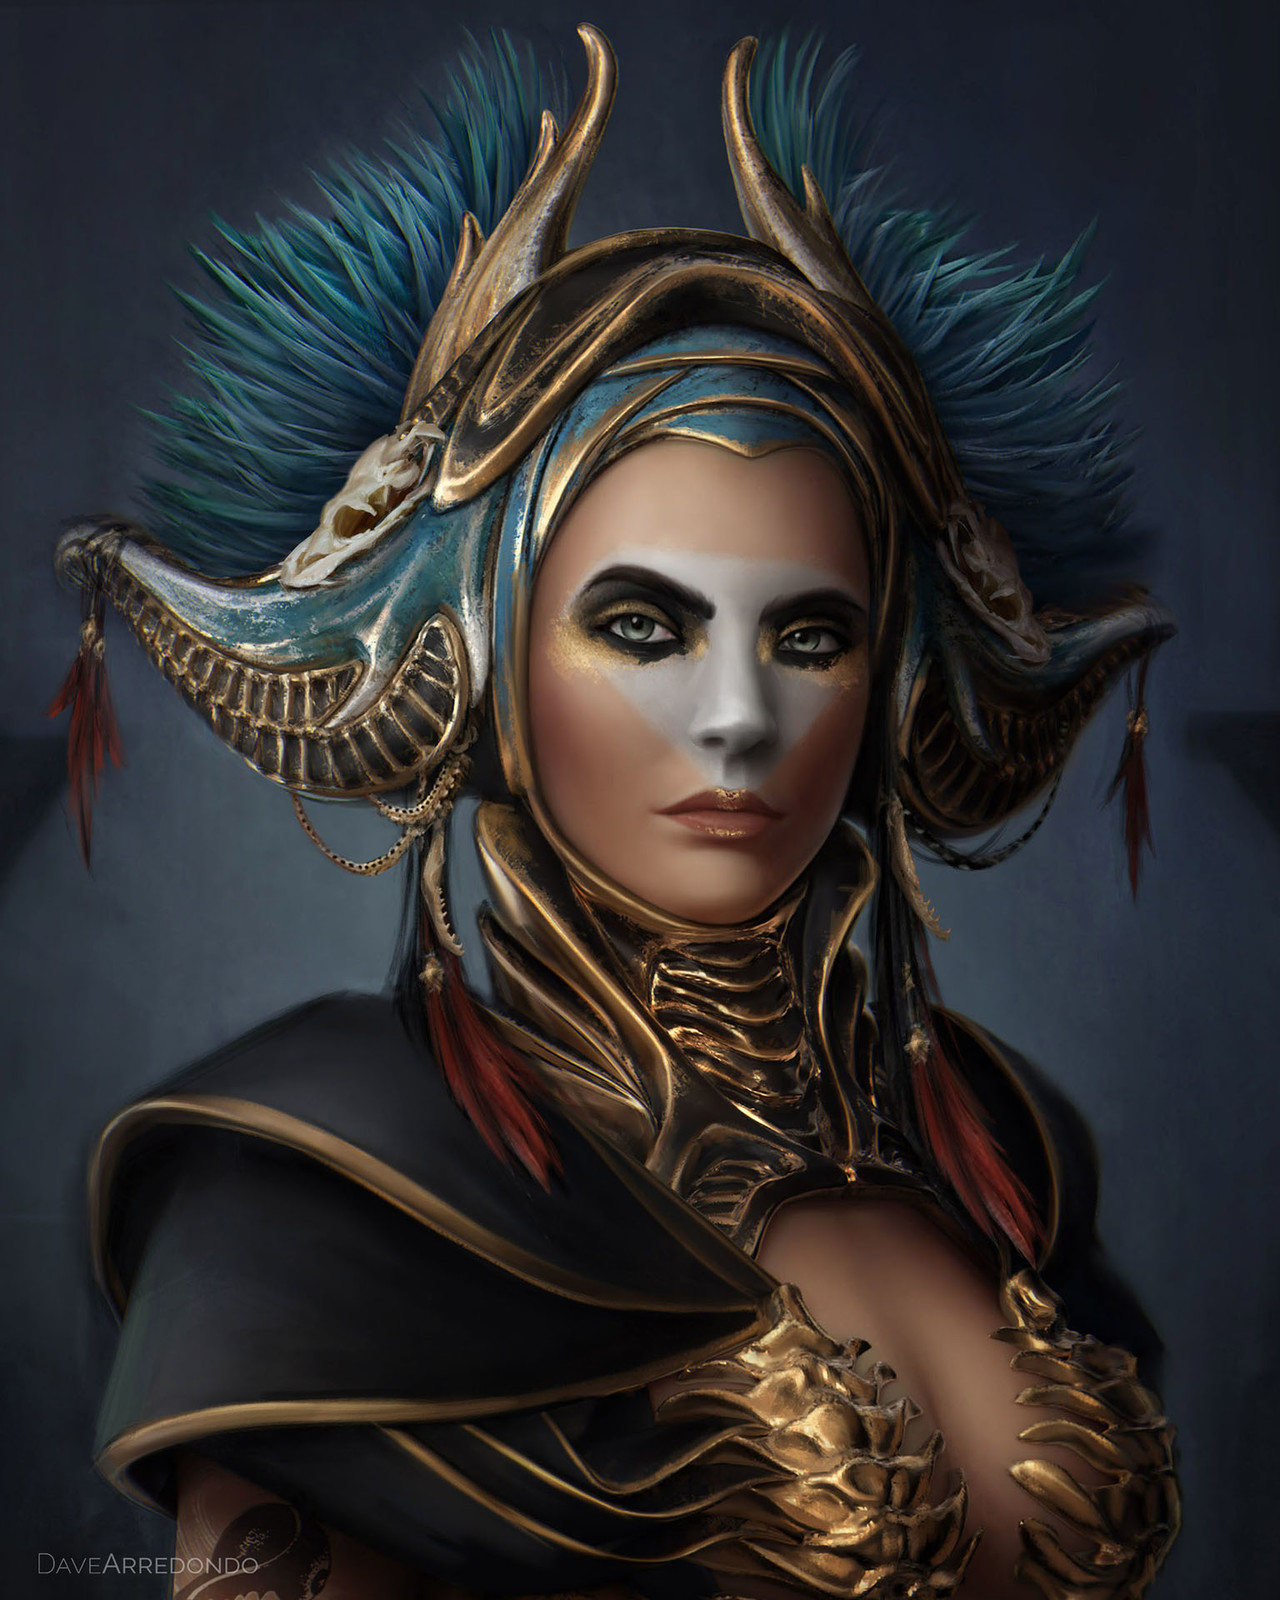 The Black Mamba Queen